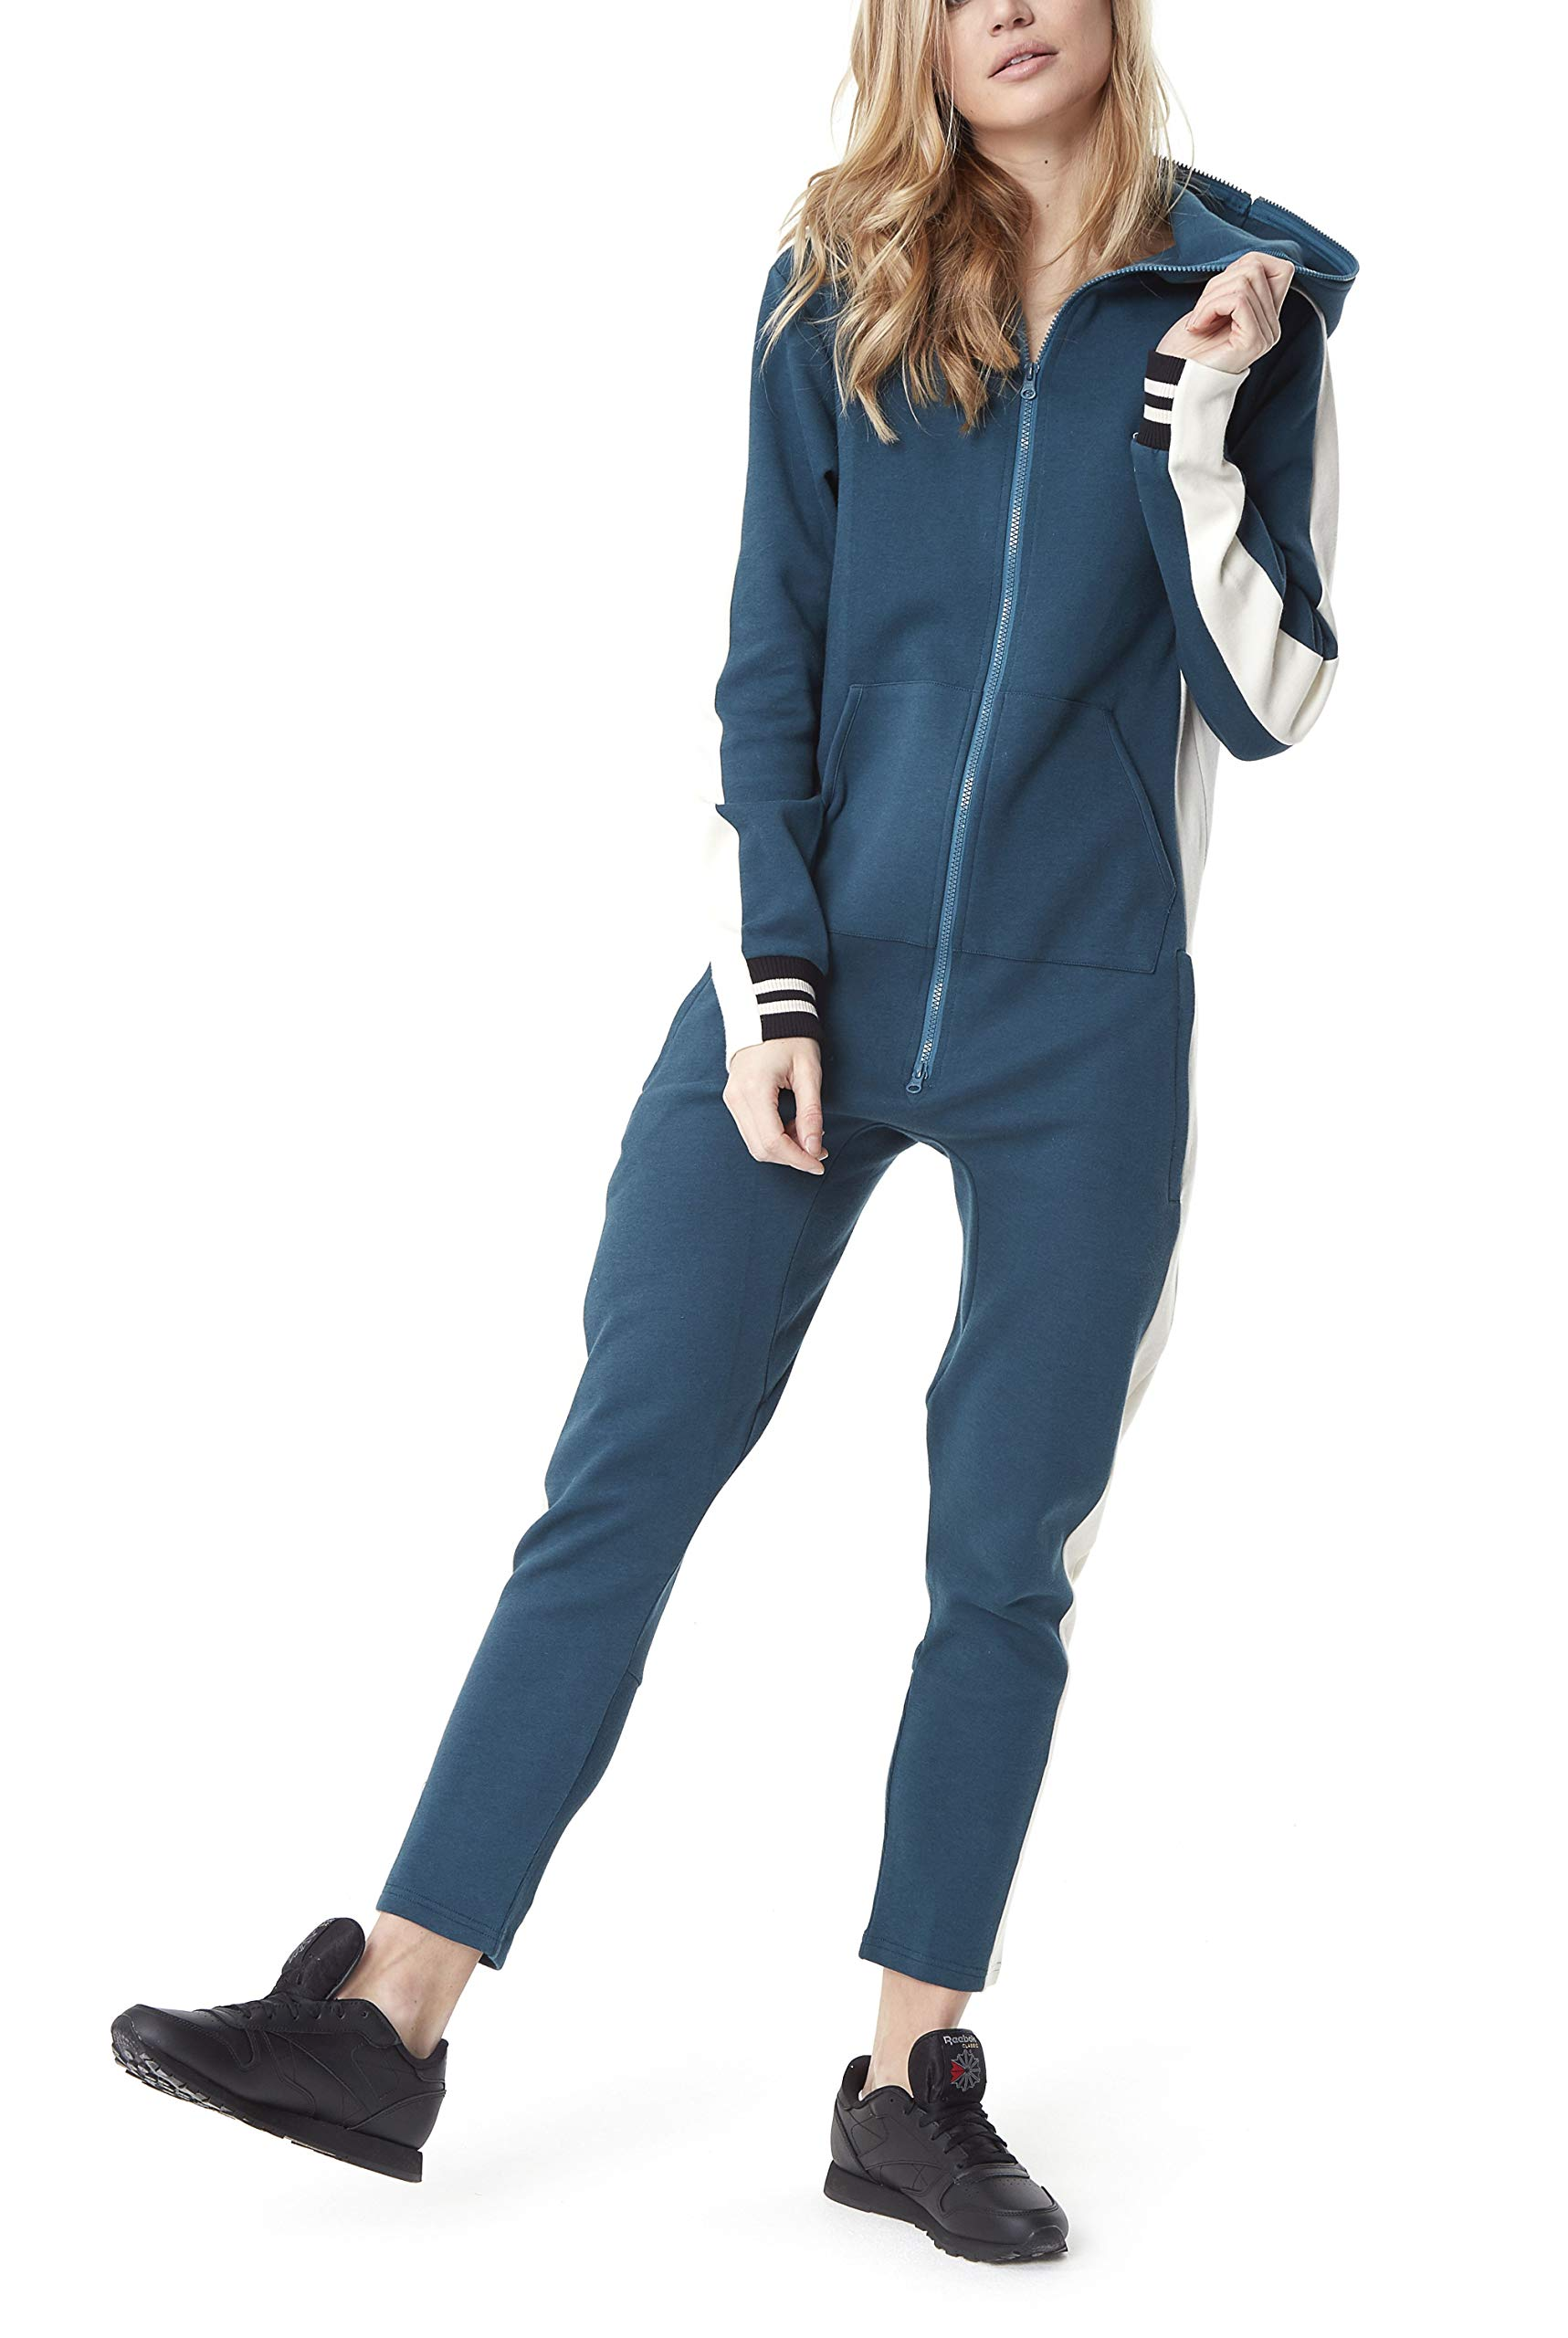 Rider Dark Unisex Onepiece Jumpsuit One Piece Femme CombinaisonVert GreenSmall v7YgyIbf6